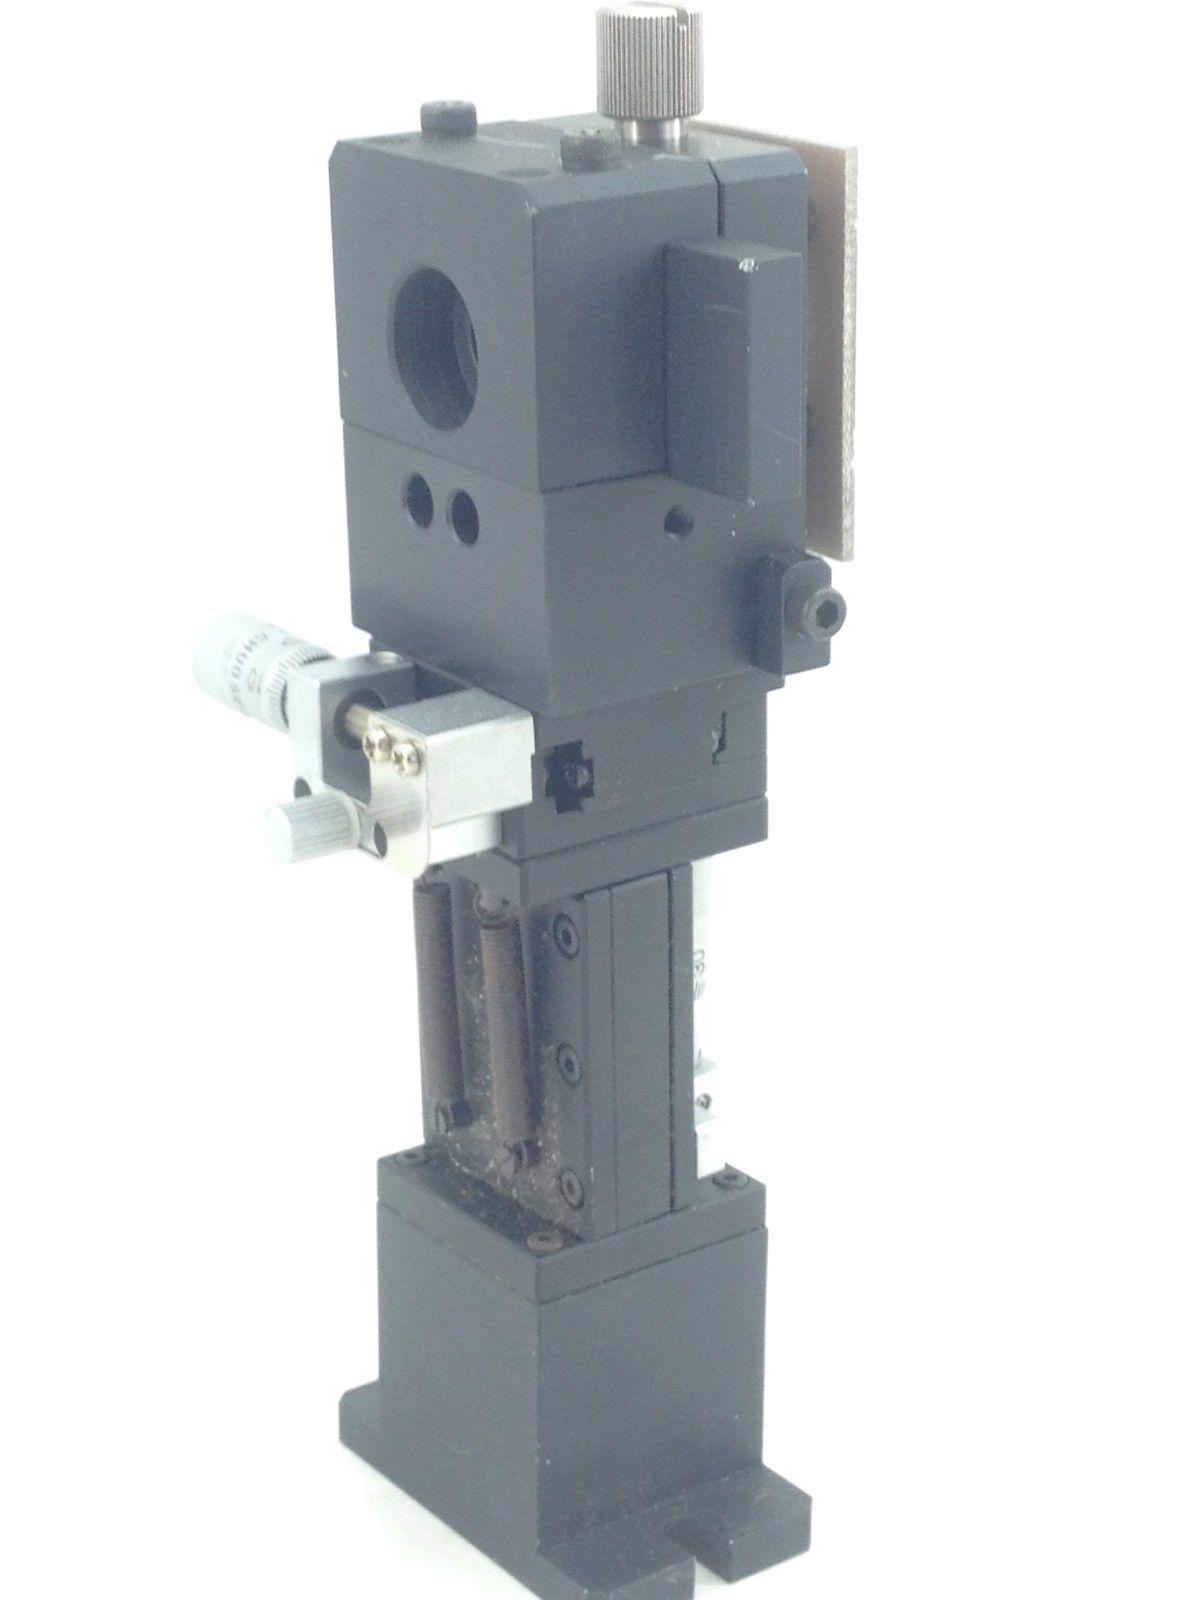 OPTOMECHANICAL ASSY W/ 021128 MICRO-CONTROLLER BOARD (H330) 5